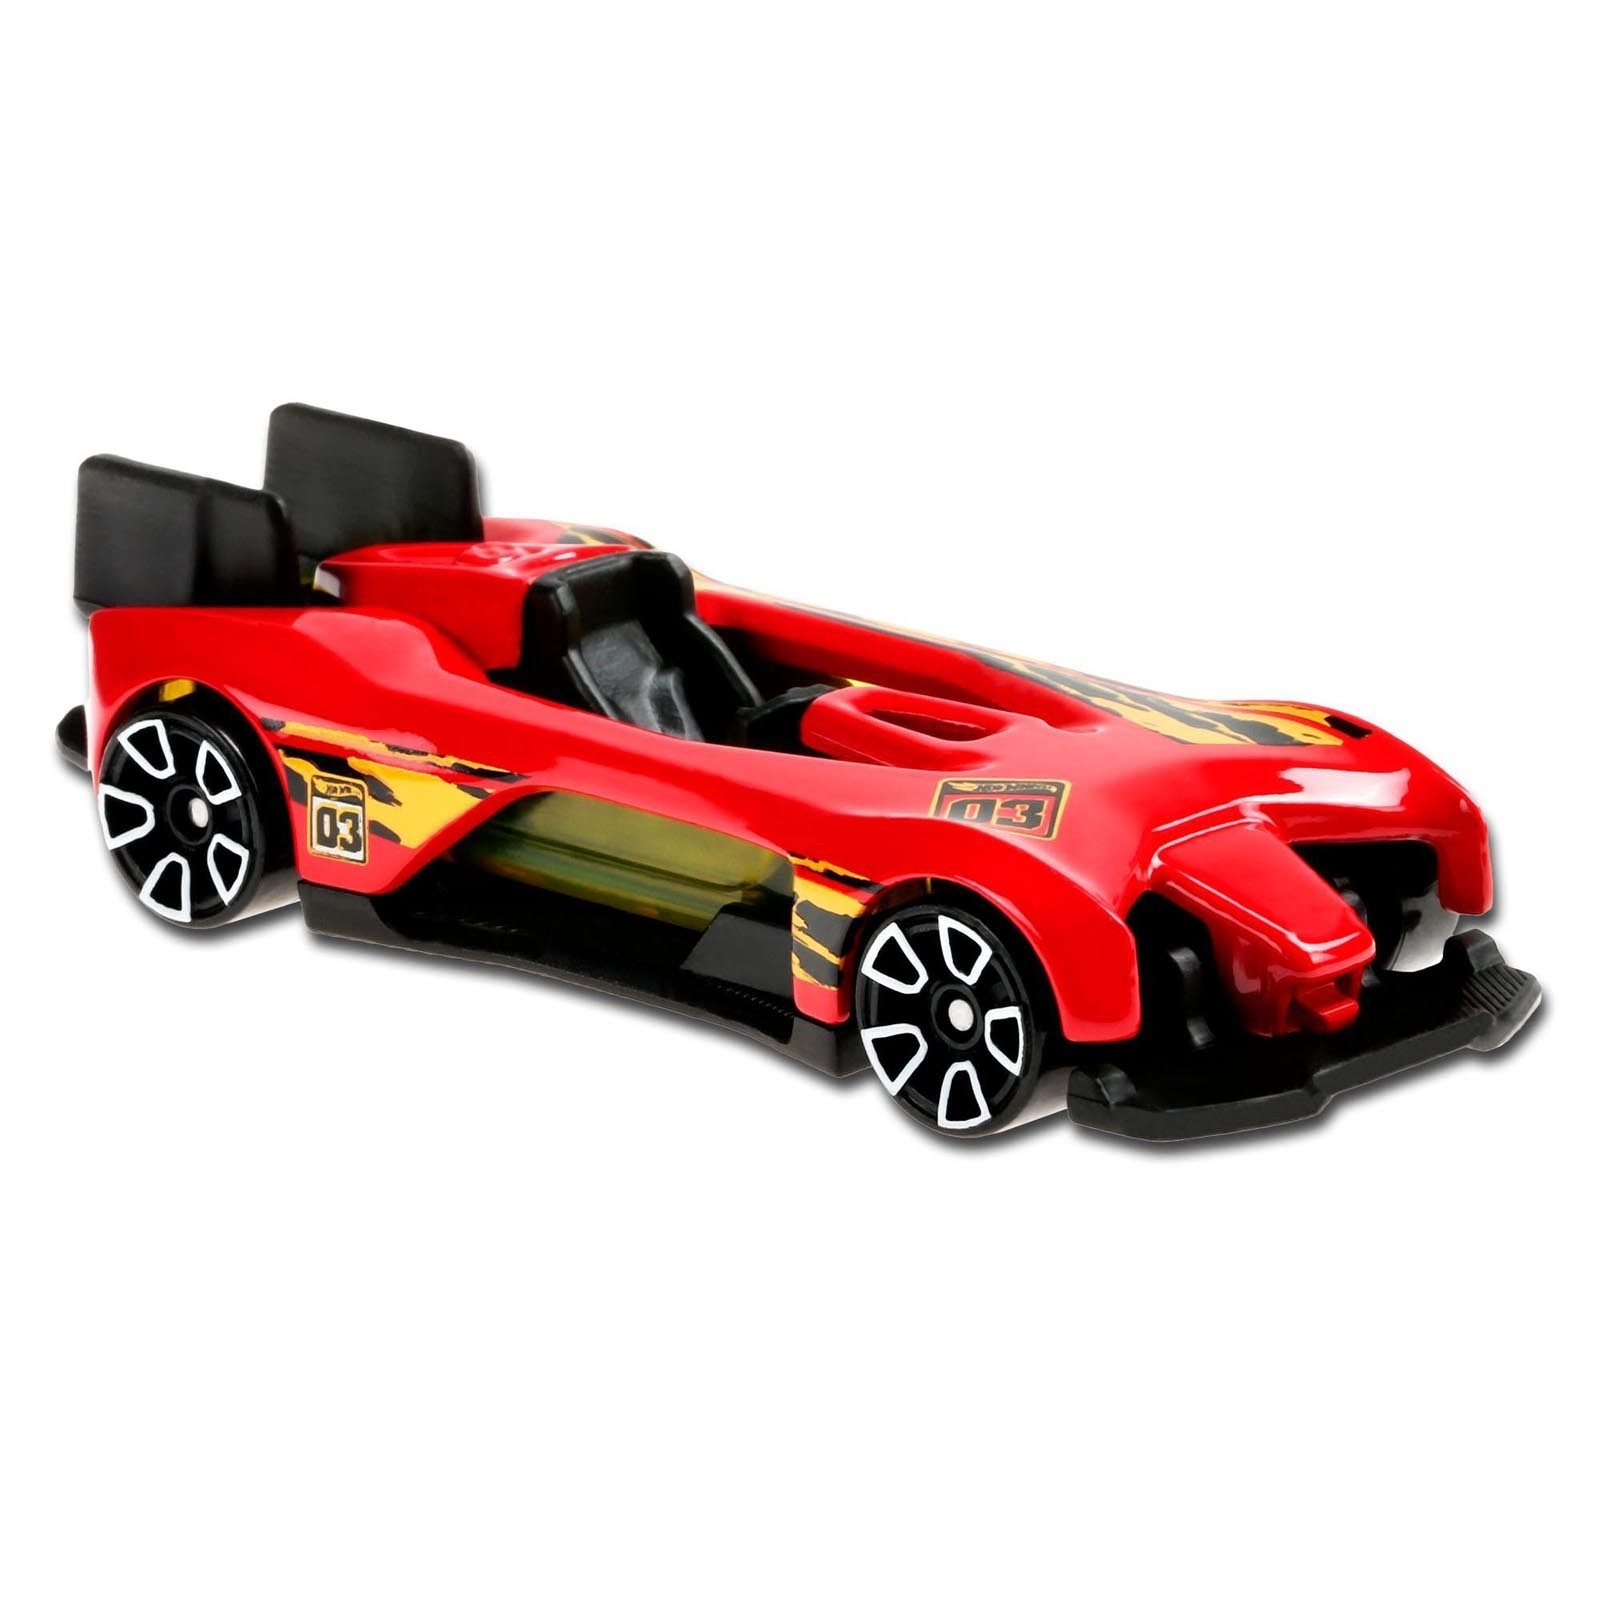 Carrinho Hot Wheels Electro Silhouette (HWN74) Hw Exotics - Mattel